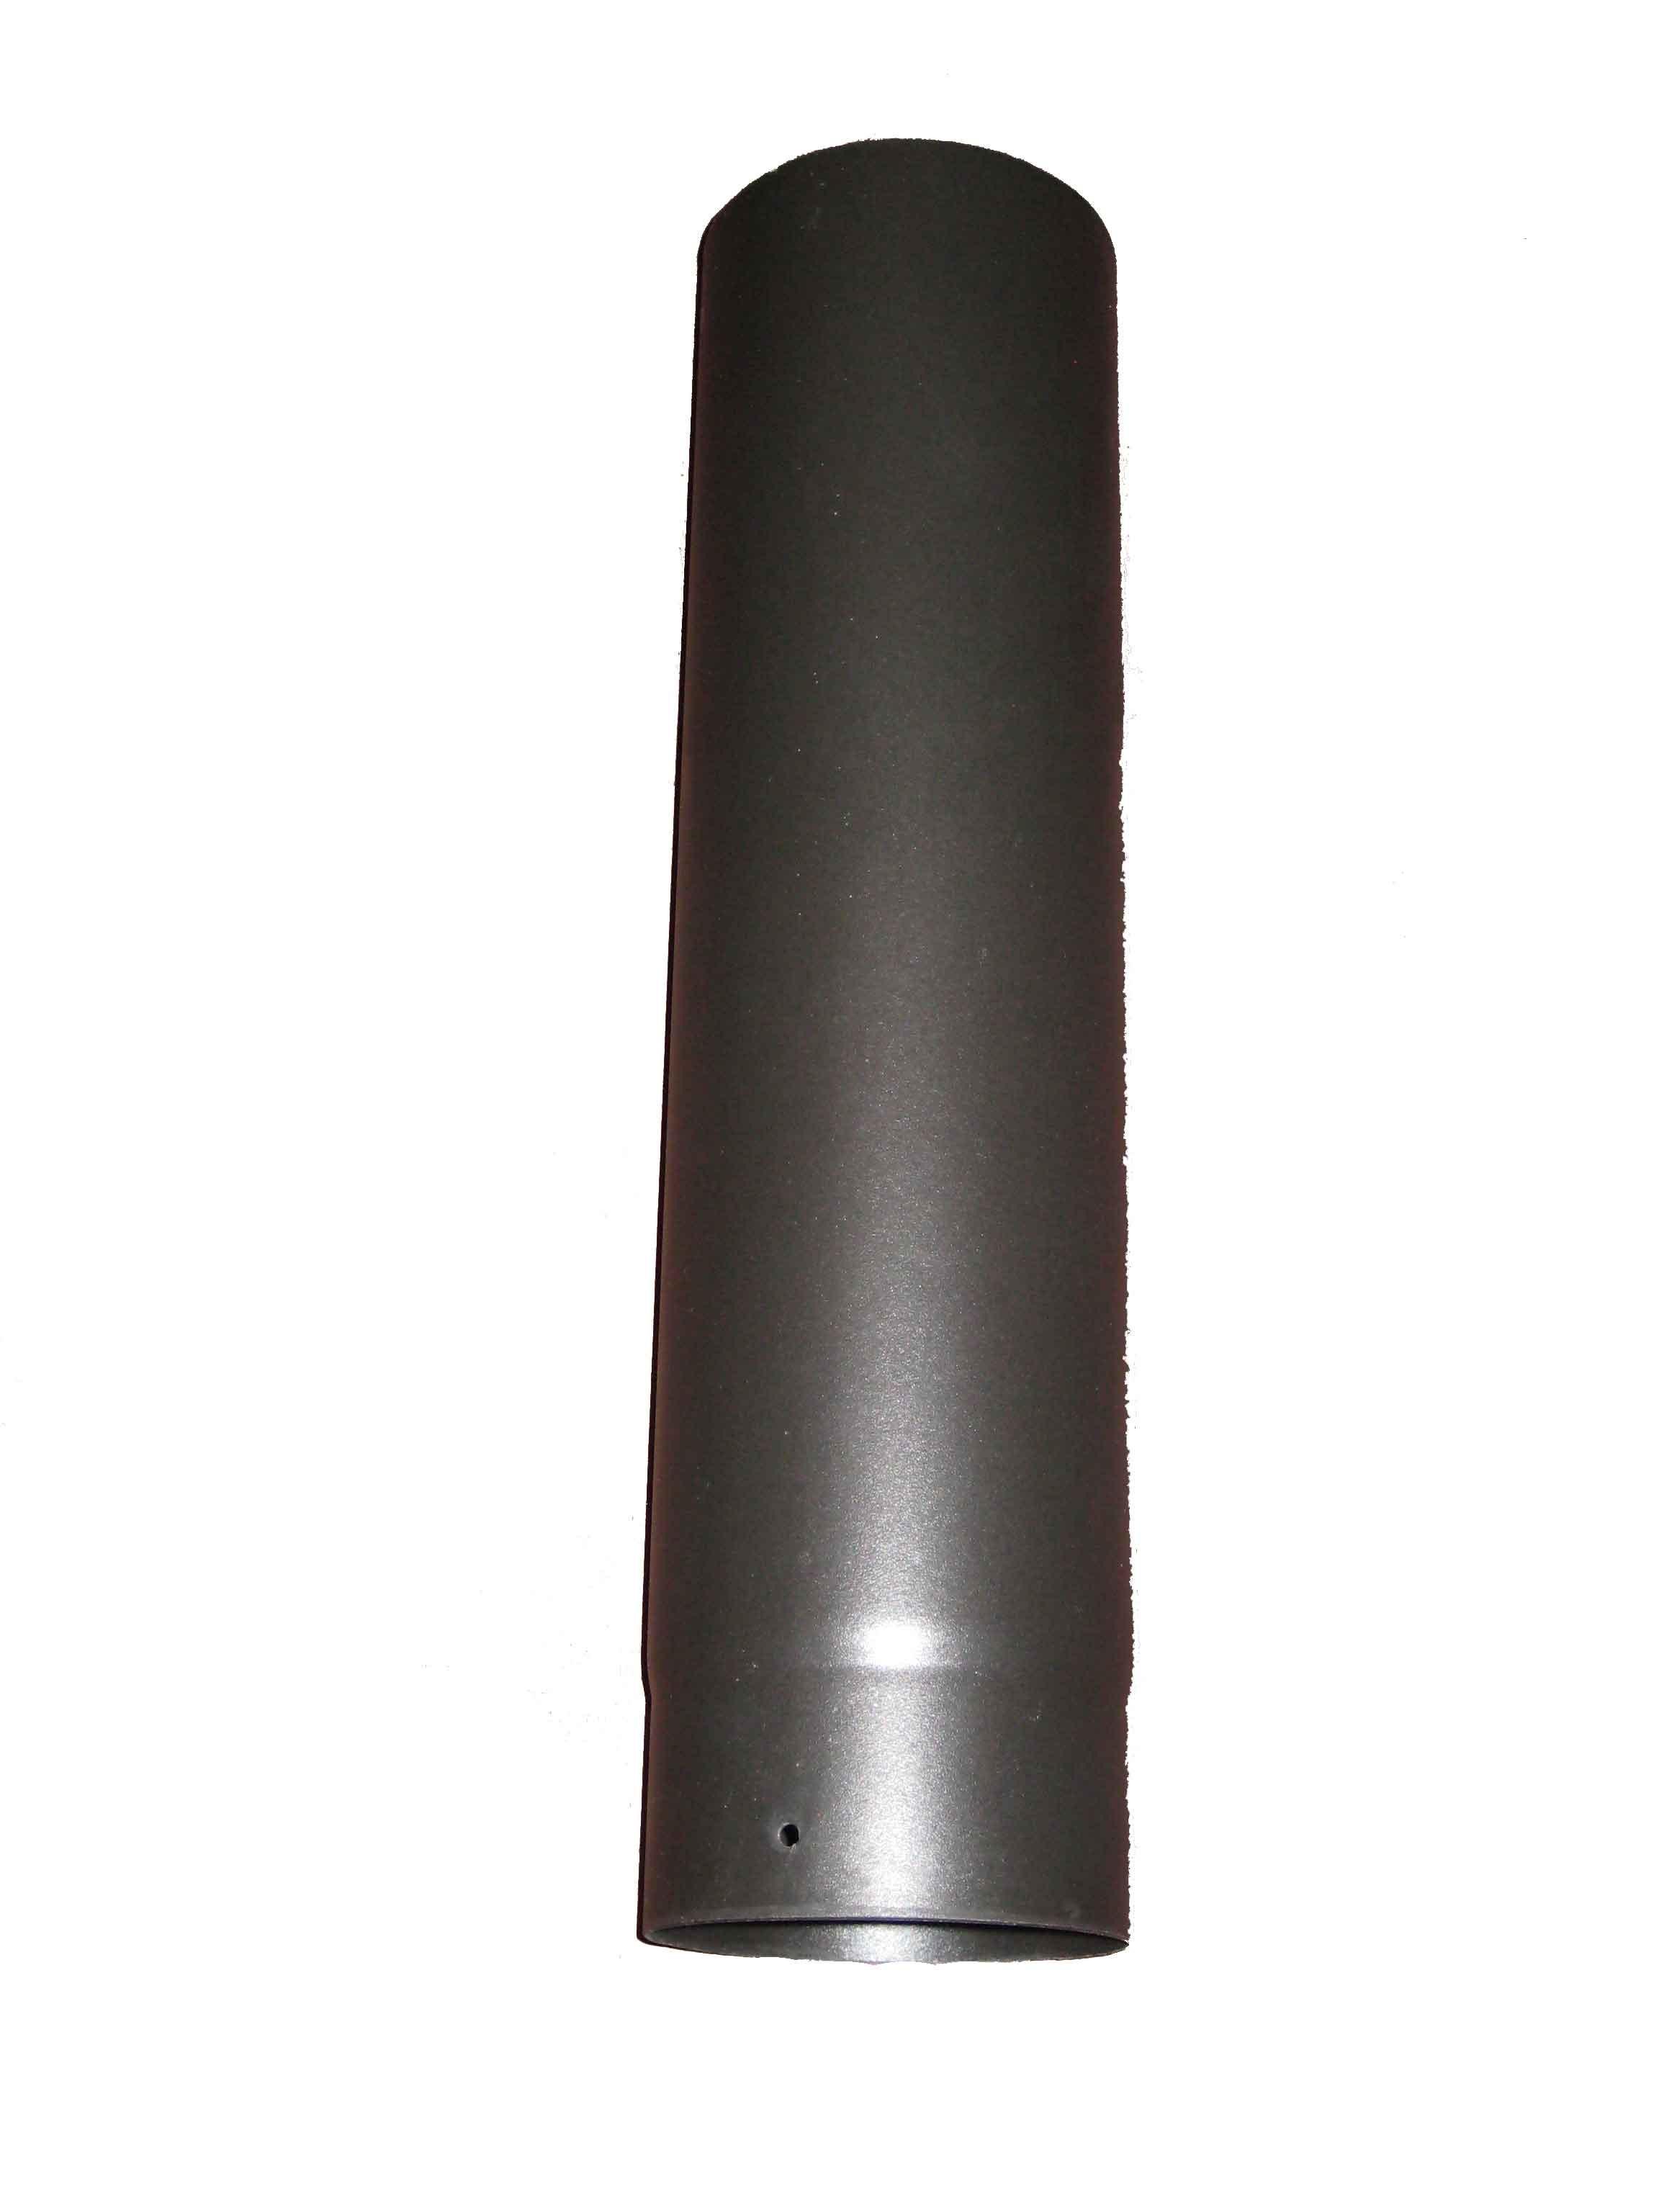 "Matt Black Enamel 500mm Straight MBE Pipe 6"""